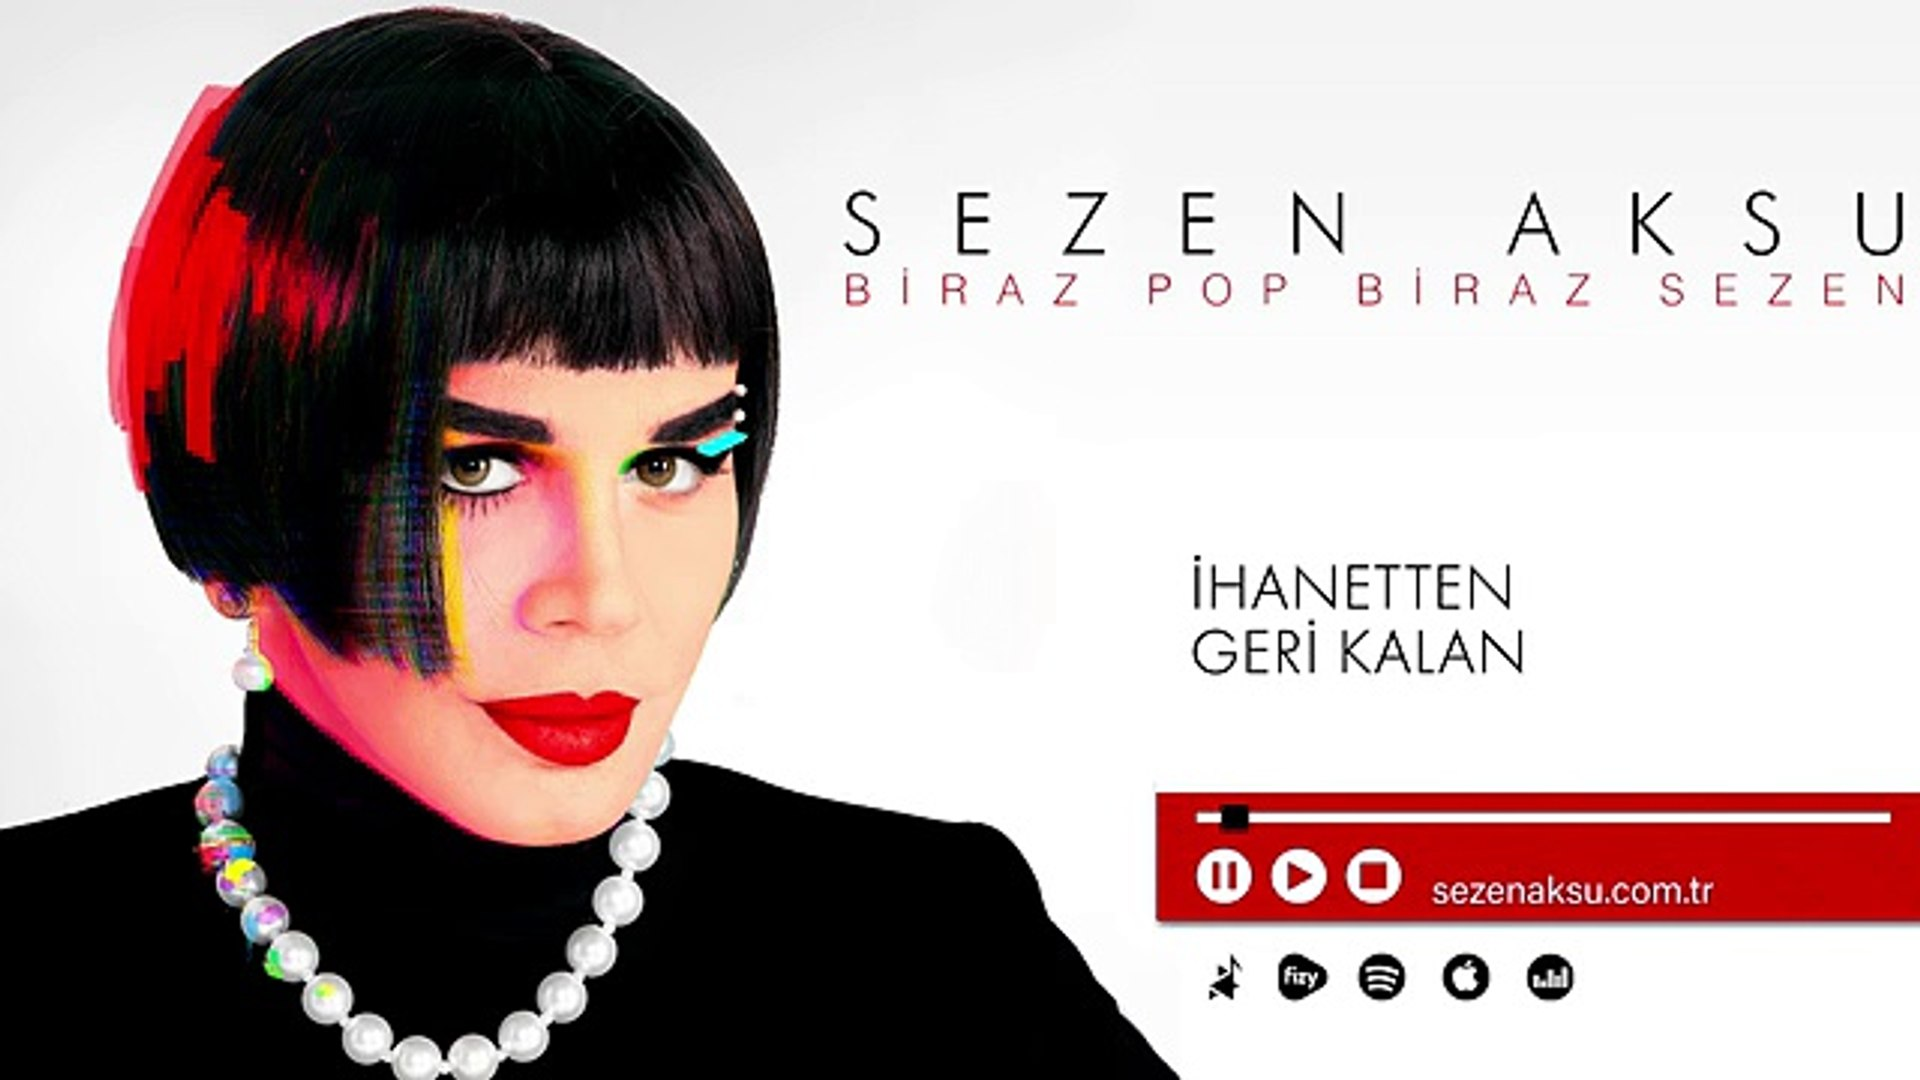 Sezen Aksu Ihanetten Geri Kalan Official Audio Dailymotion Video